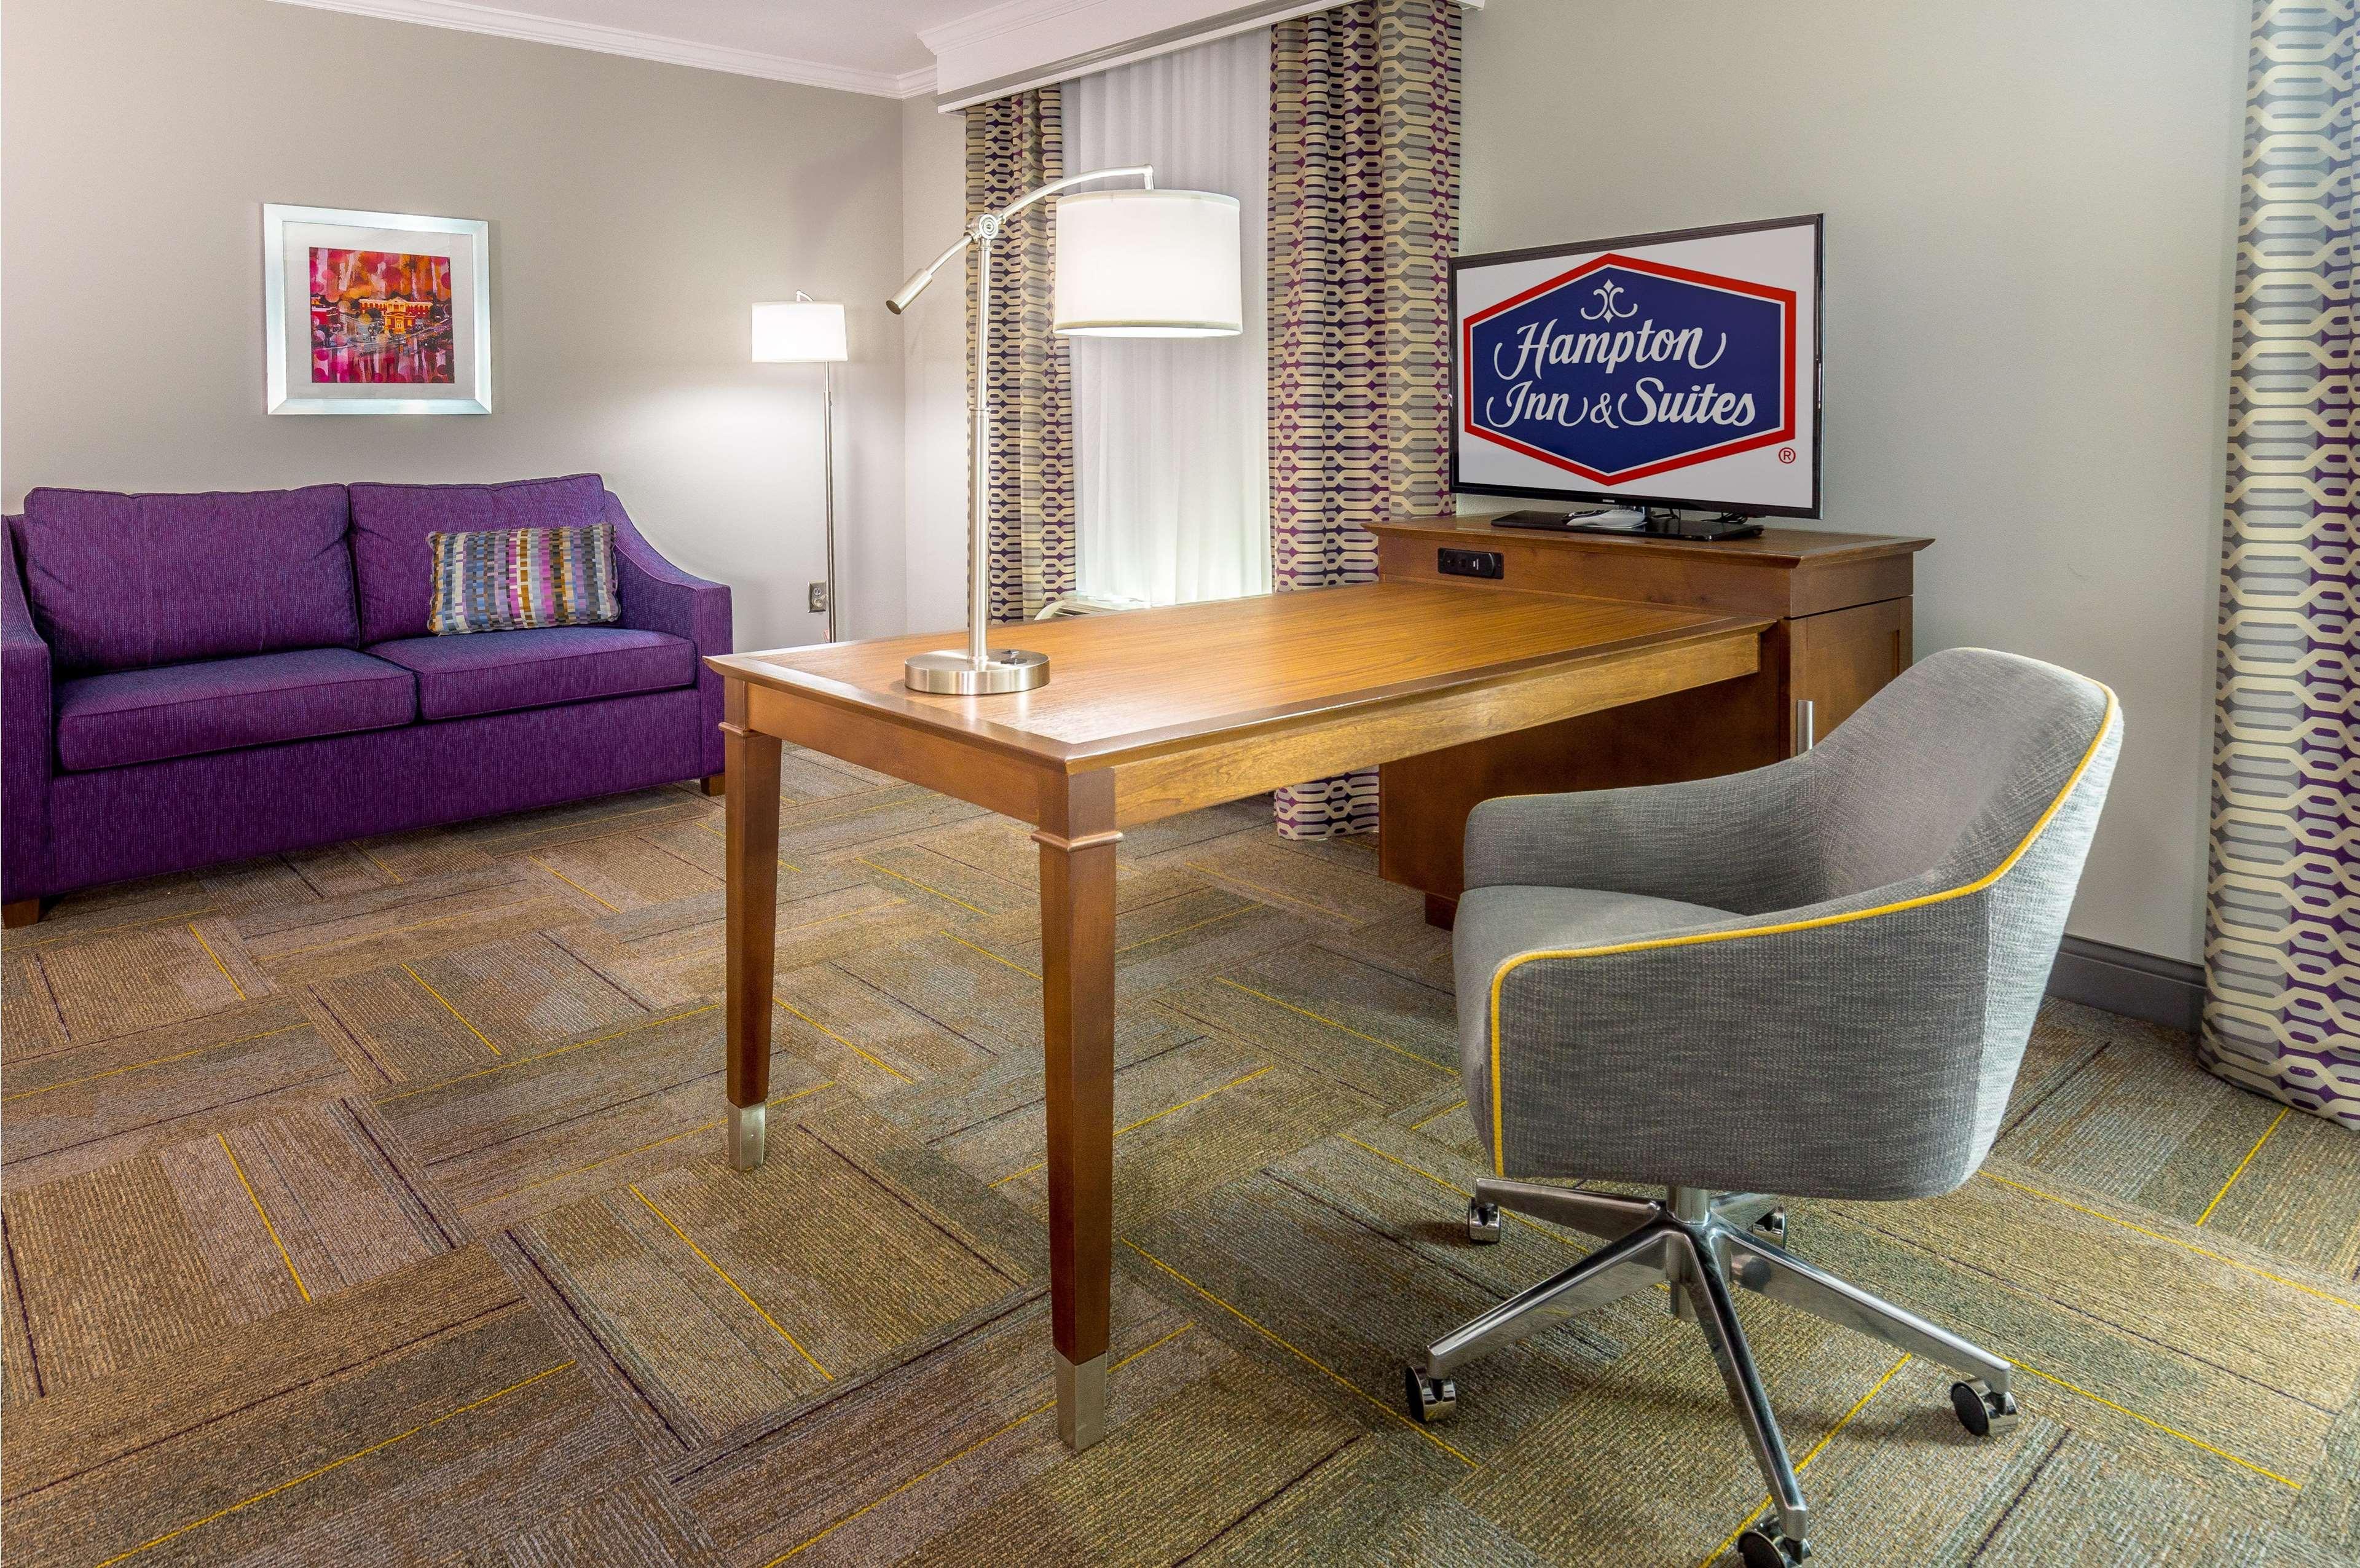 Hampton Inn & Suites Dublin image 24